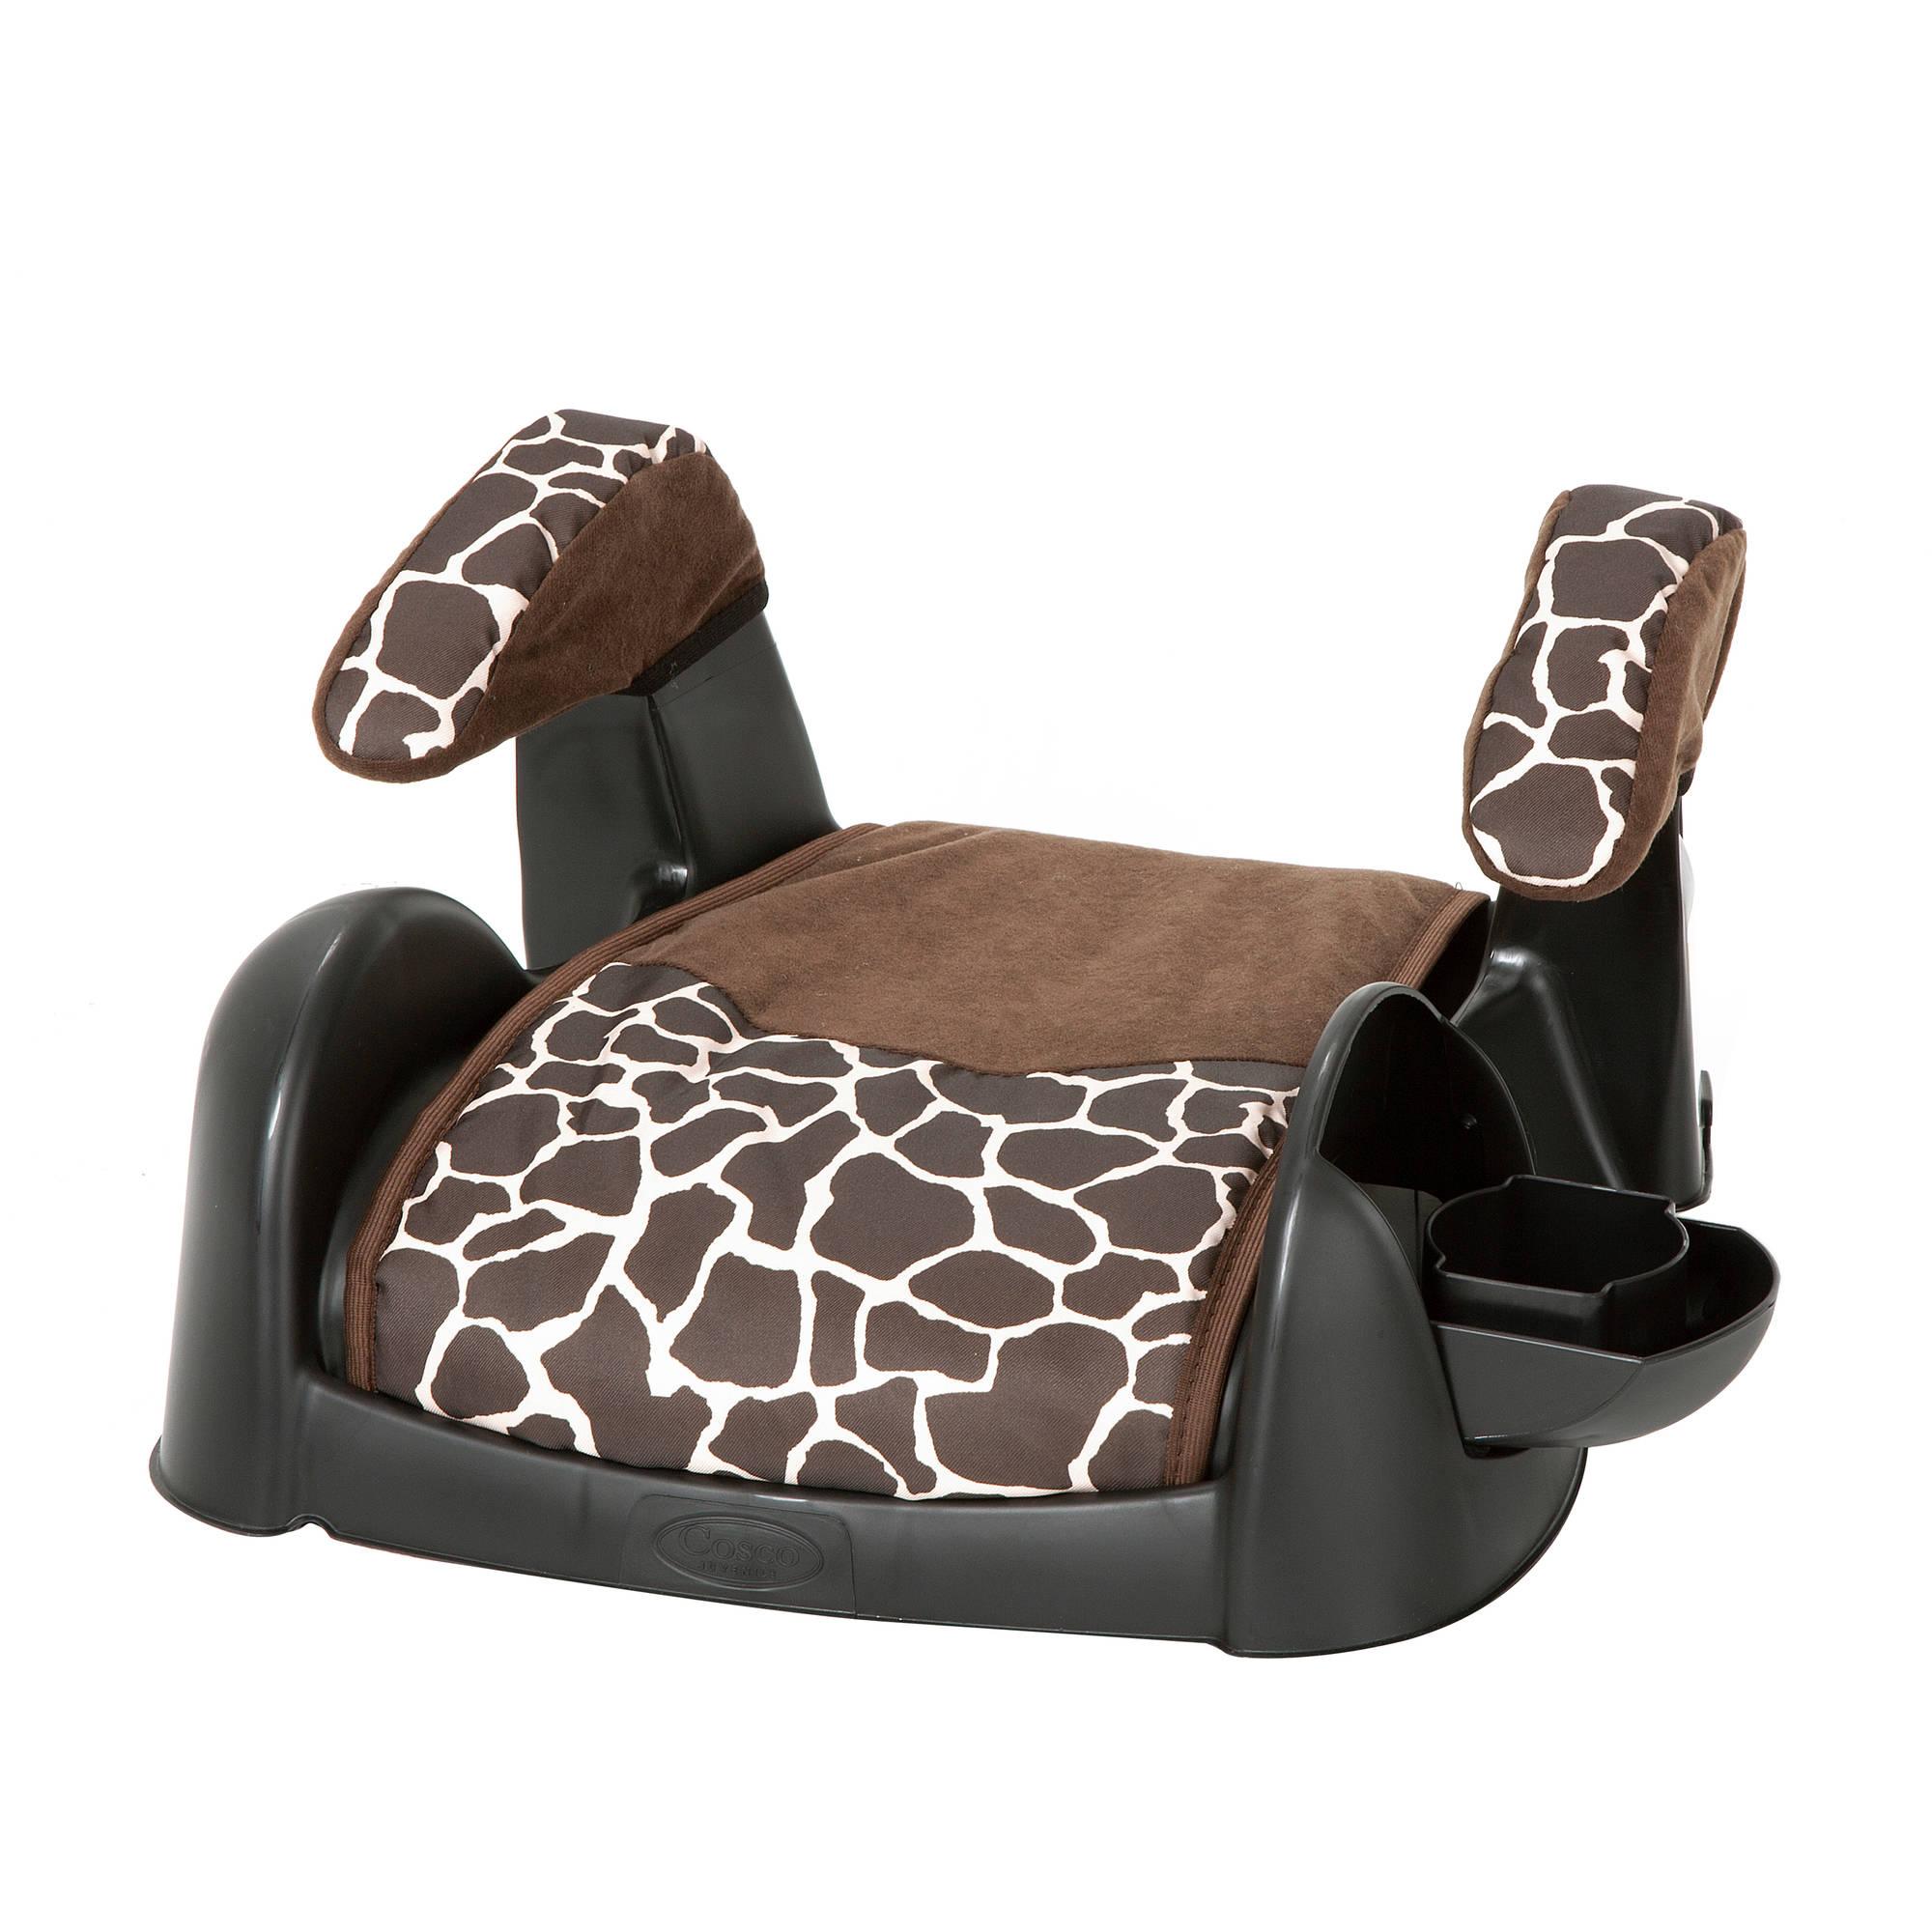 Cosco HiRise Booster Car Seat Quigley Walmart